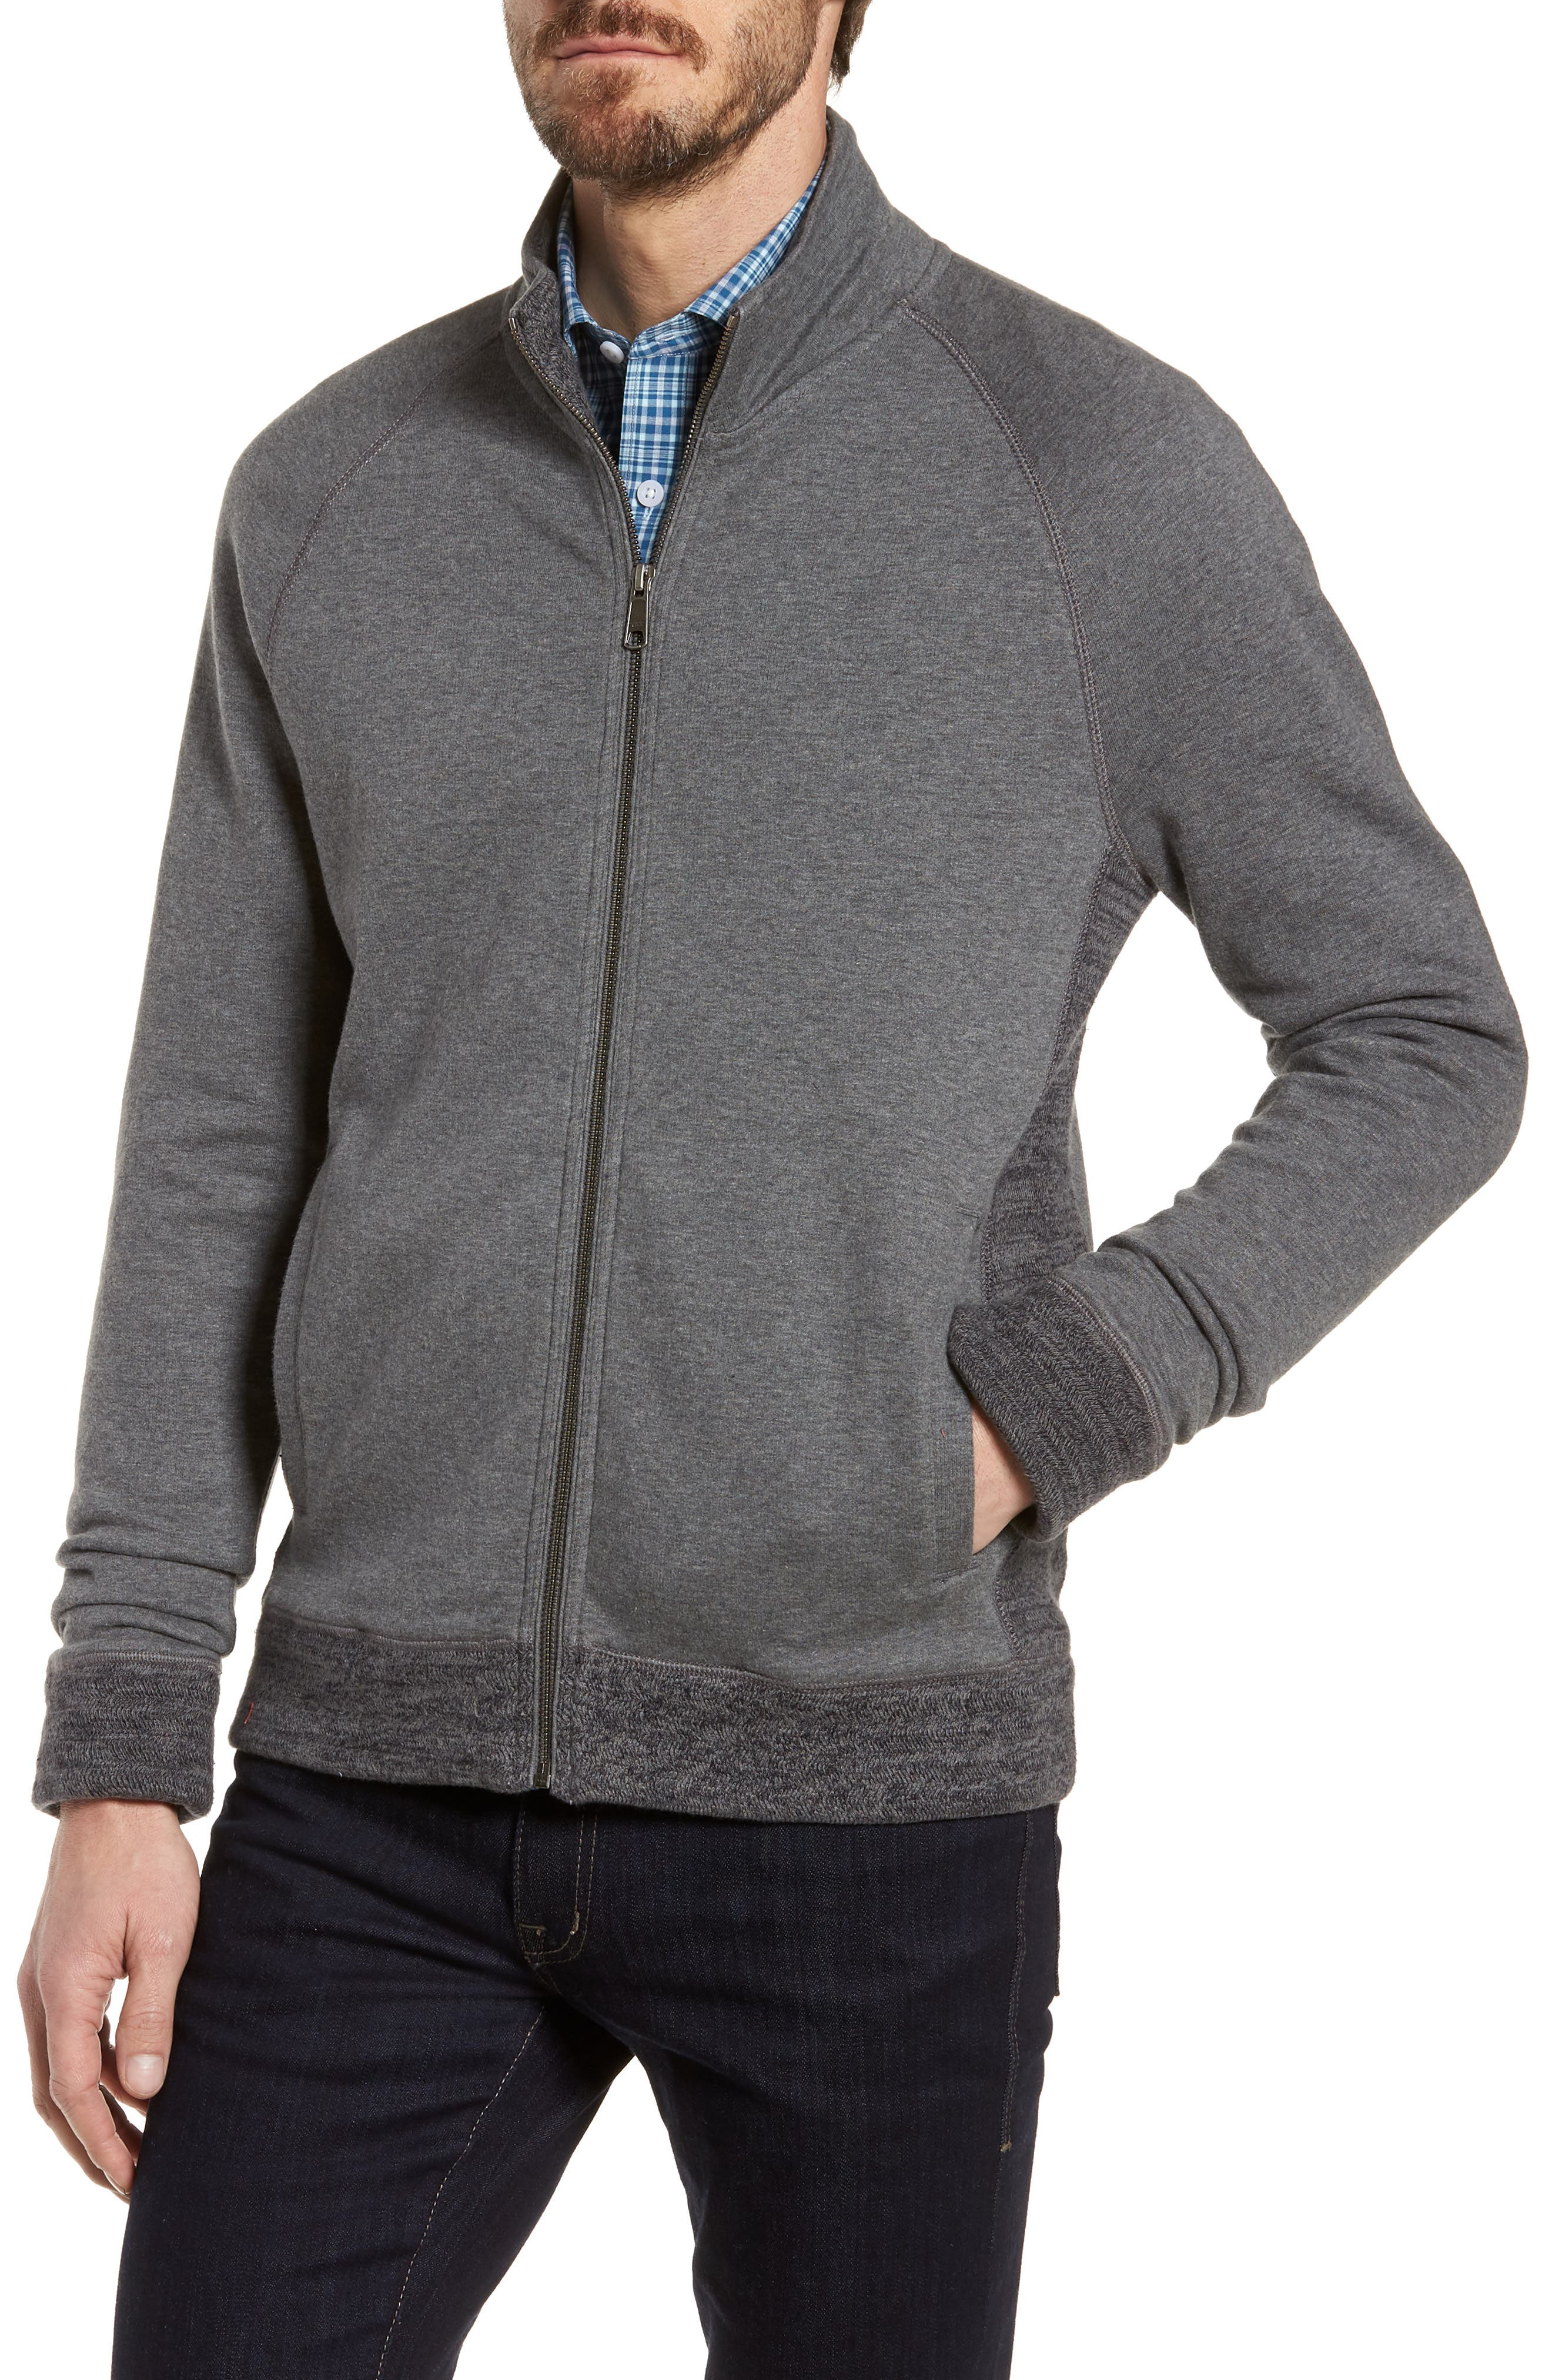 Full Zip Fleece Jacket,                             Alternate thumbnail 4, color,                             021